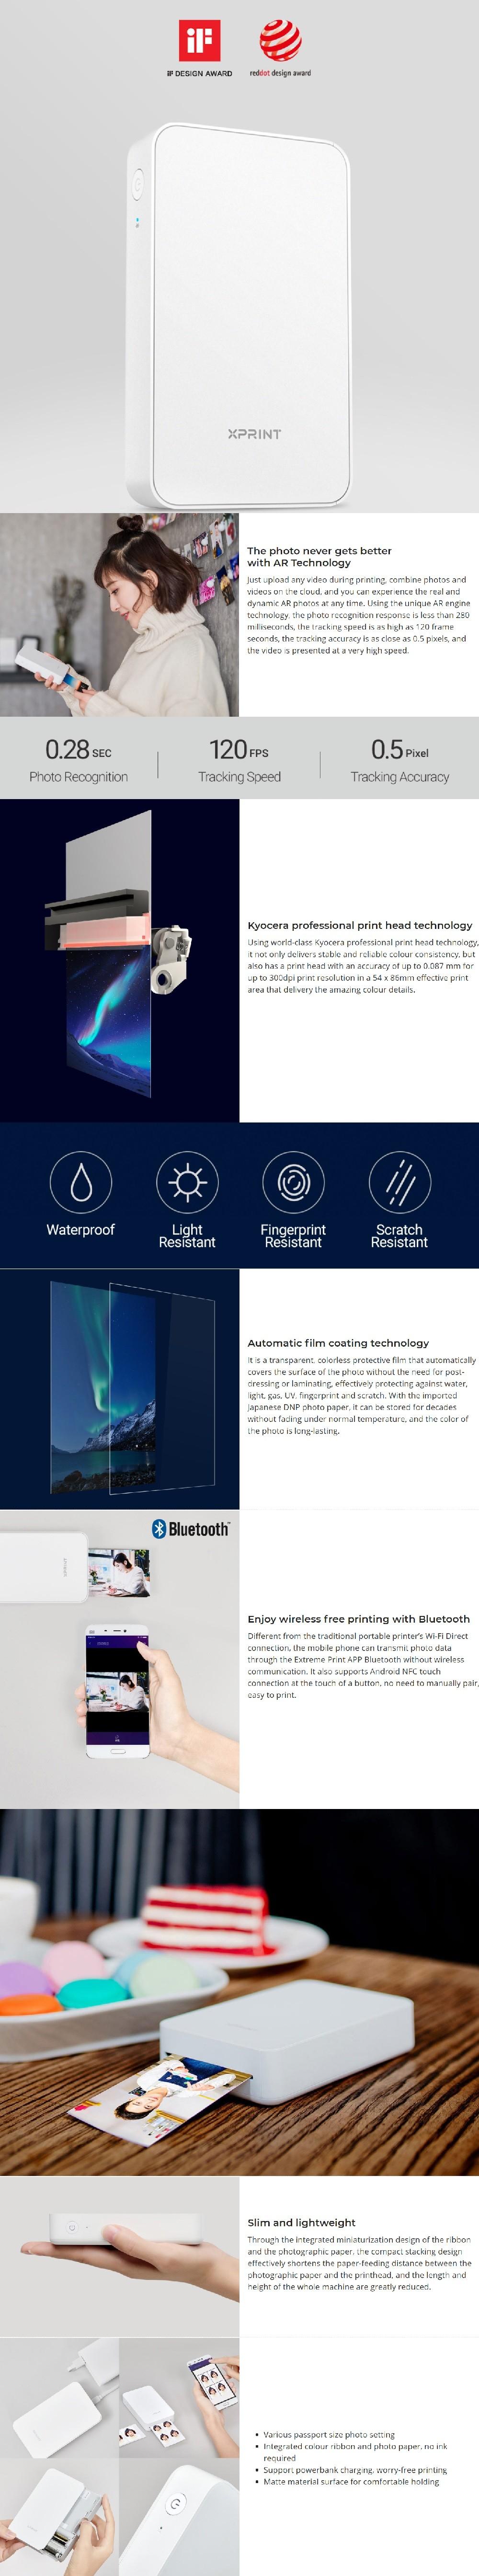 Prezentare-Xiaomi-XPrinter903f4f989bbb6631.jpg